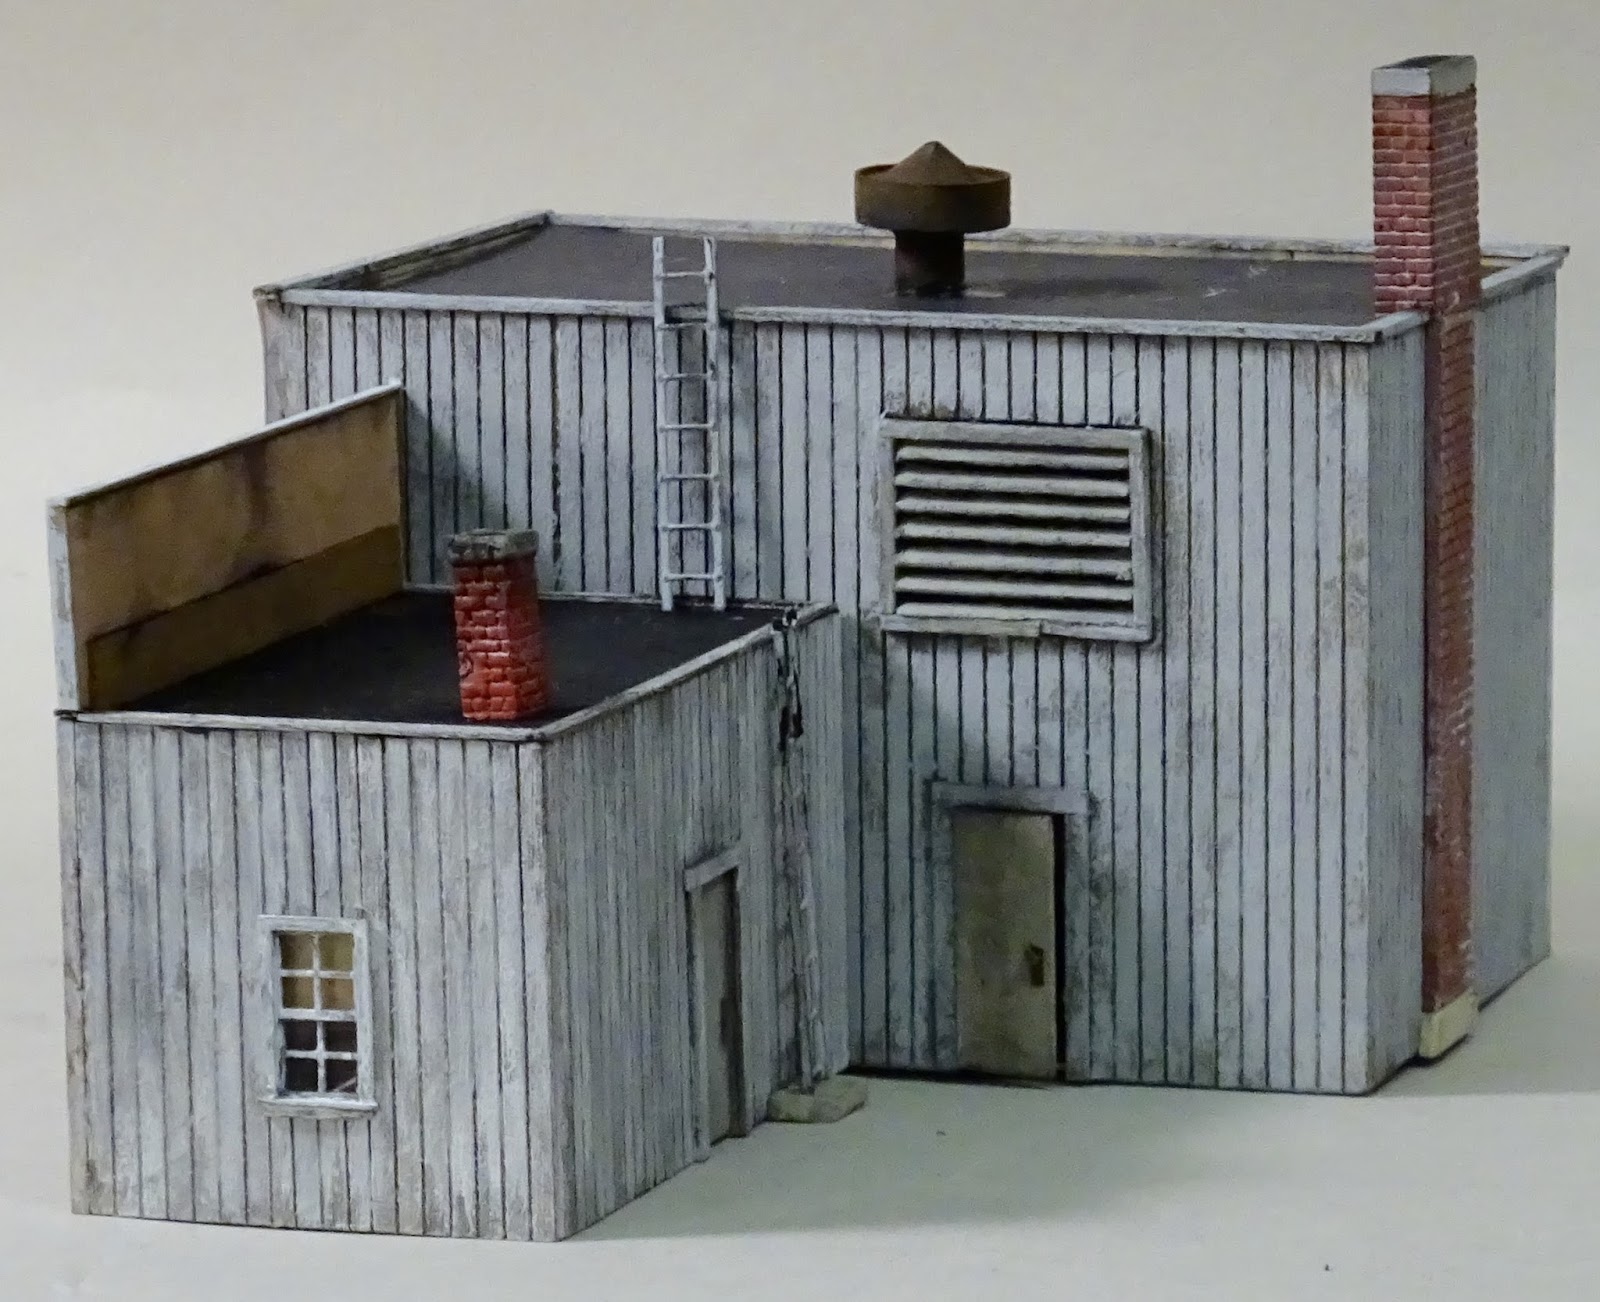 Model Railroad Minutiae Welding Shop Completed